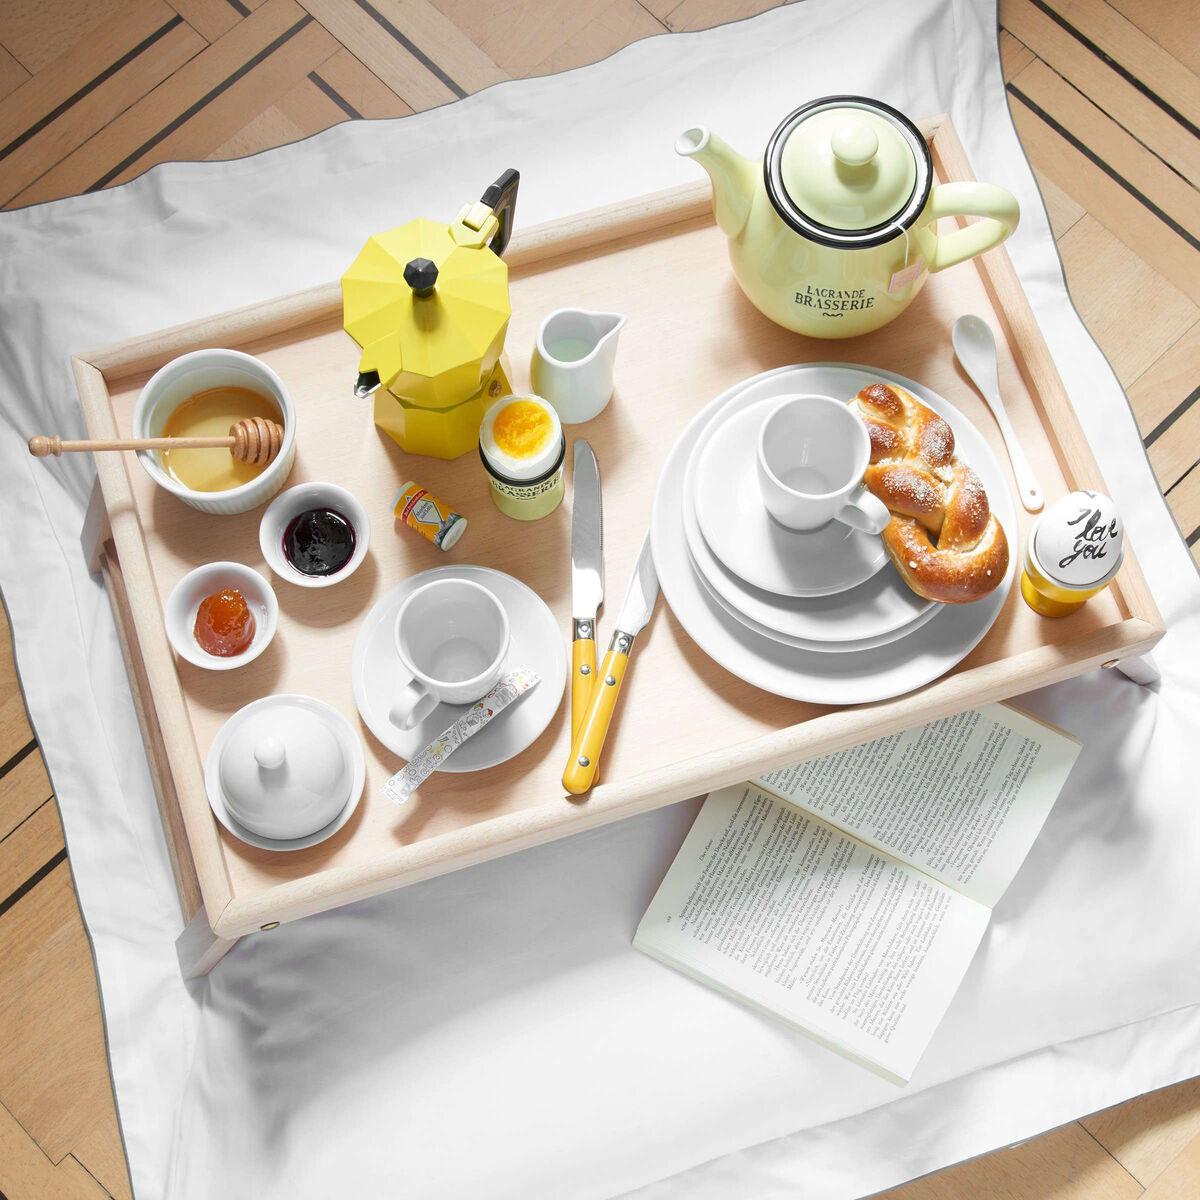 bad reichenhaller mini salz streuer butlers. Black Bedroom Furniture Sets. Home Design Ideas